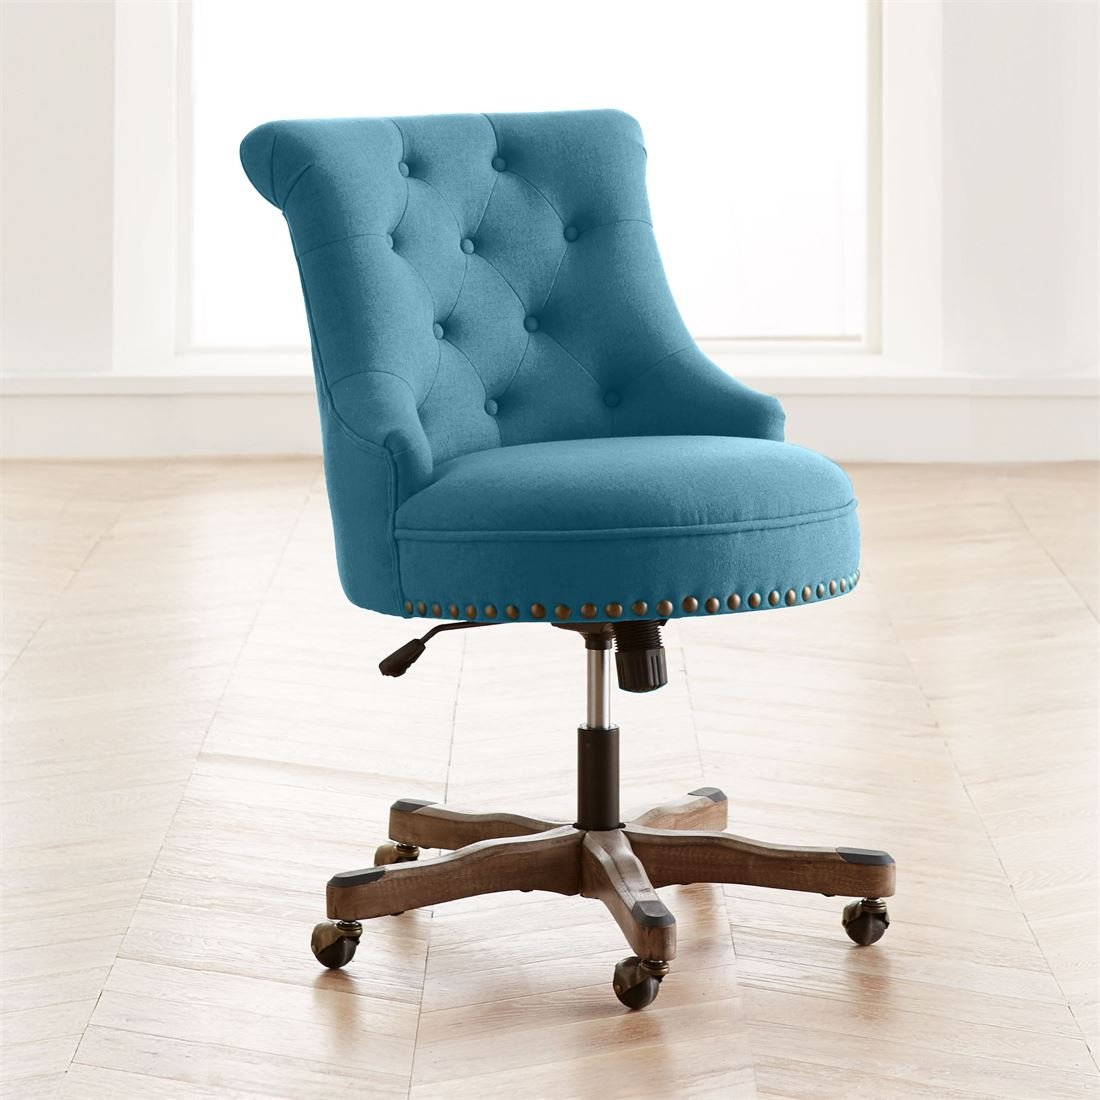 Brylanehome Sabina Office Chair (Turquoise,0)